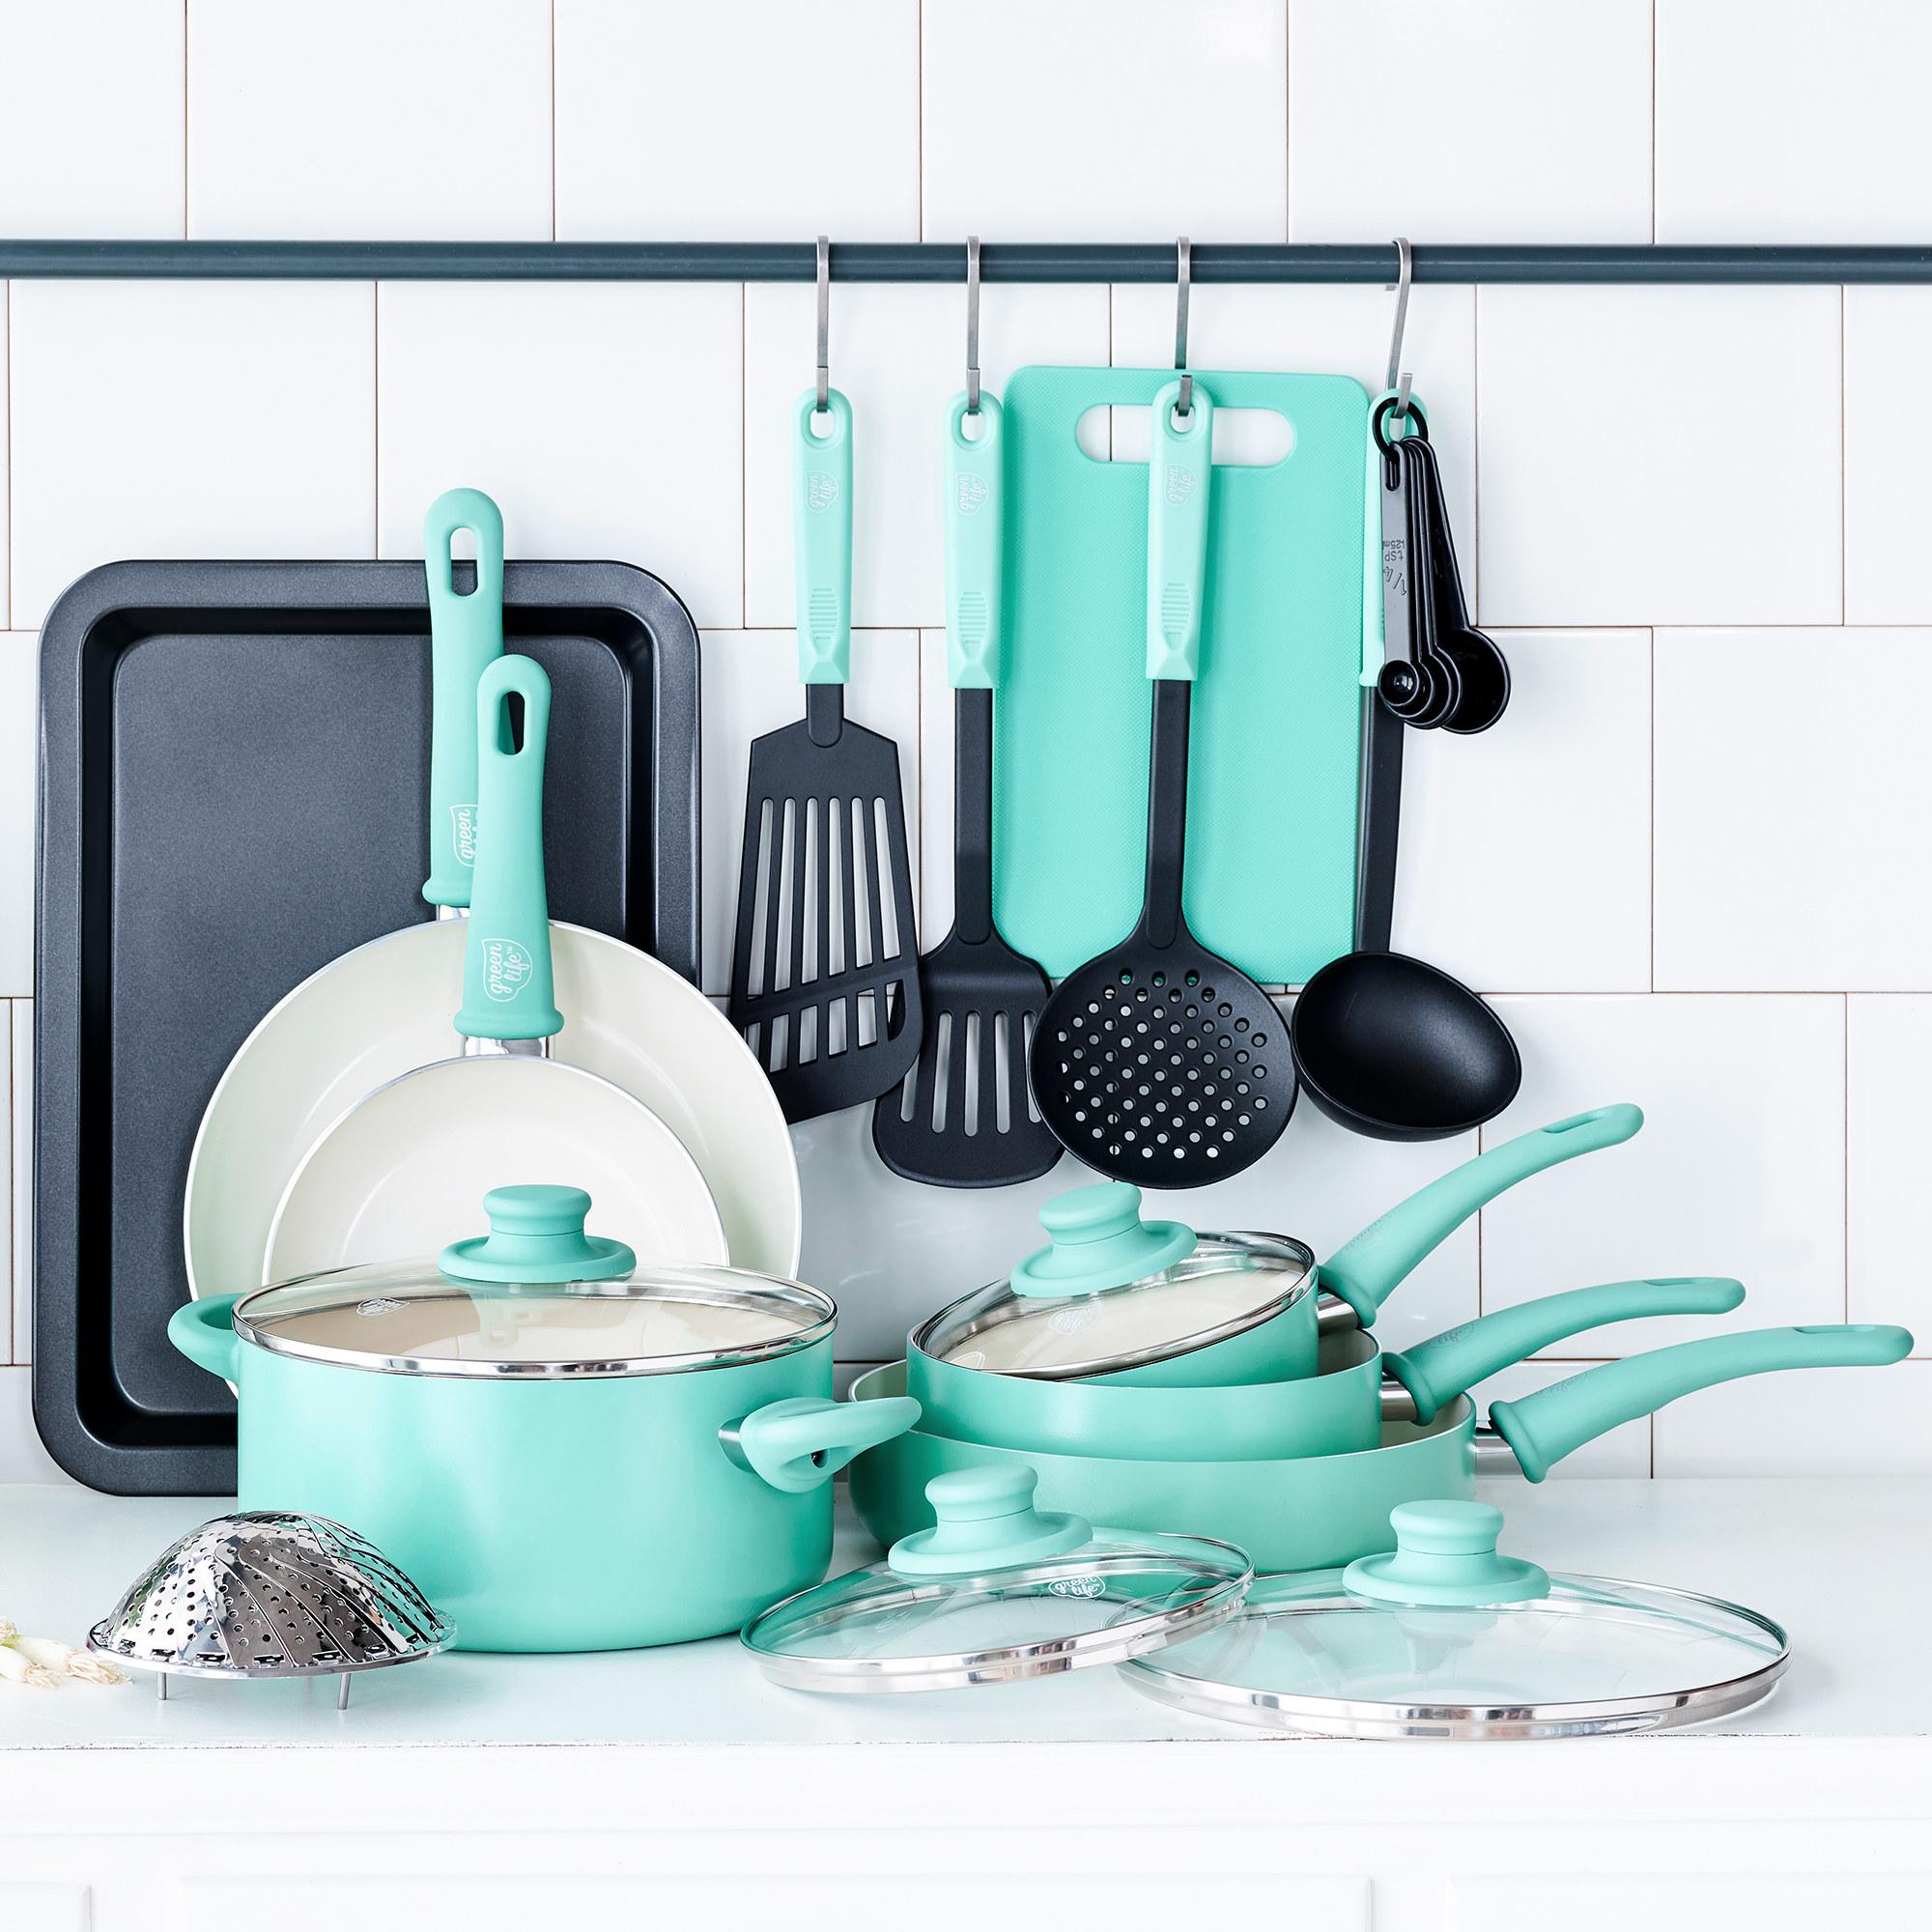 a light blue set of pots, pans, and utensils